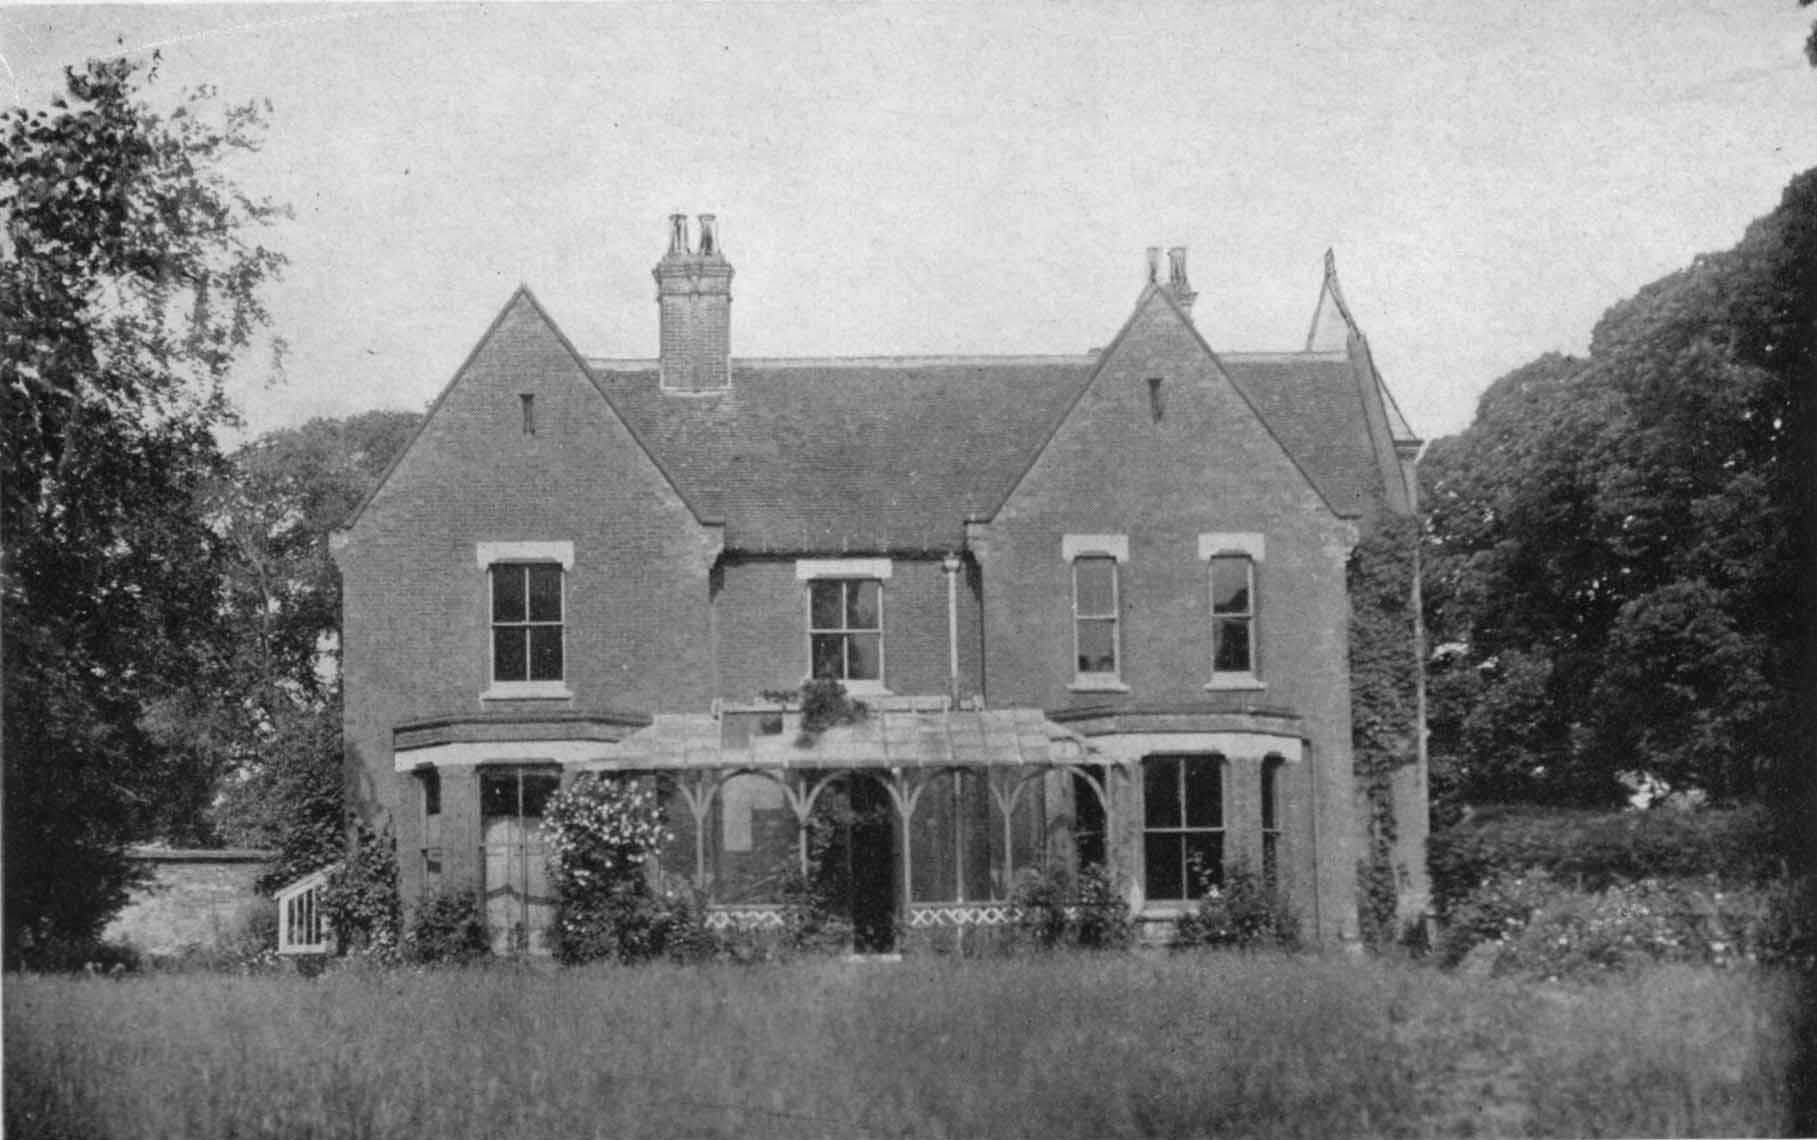 Borley Rectory, Borley, England c. 1920s